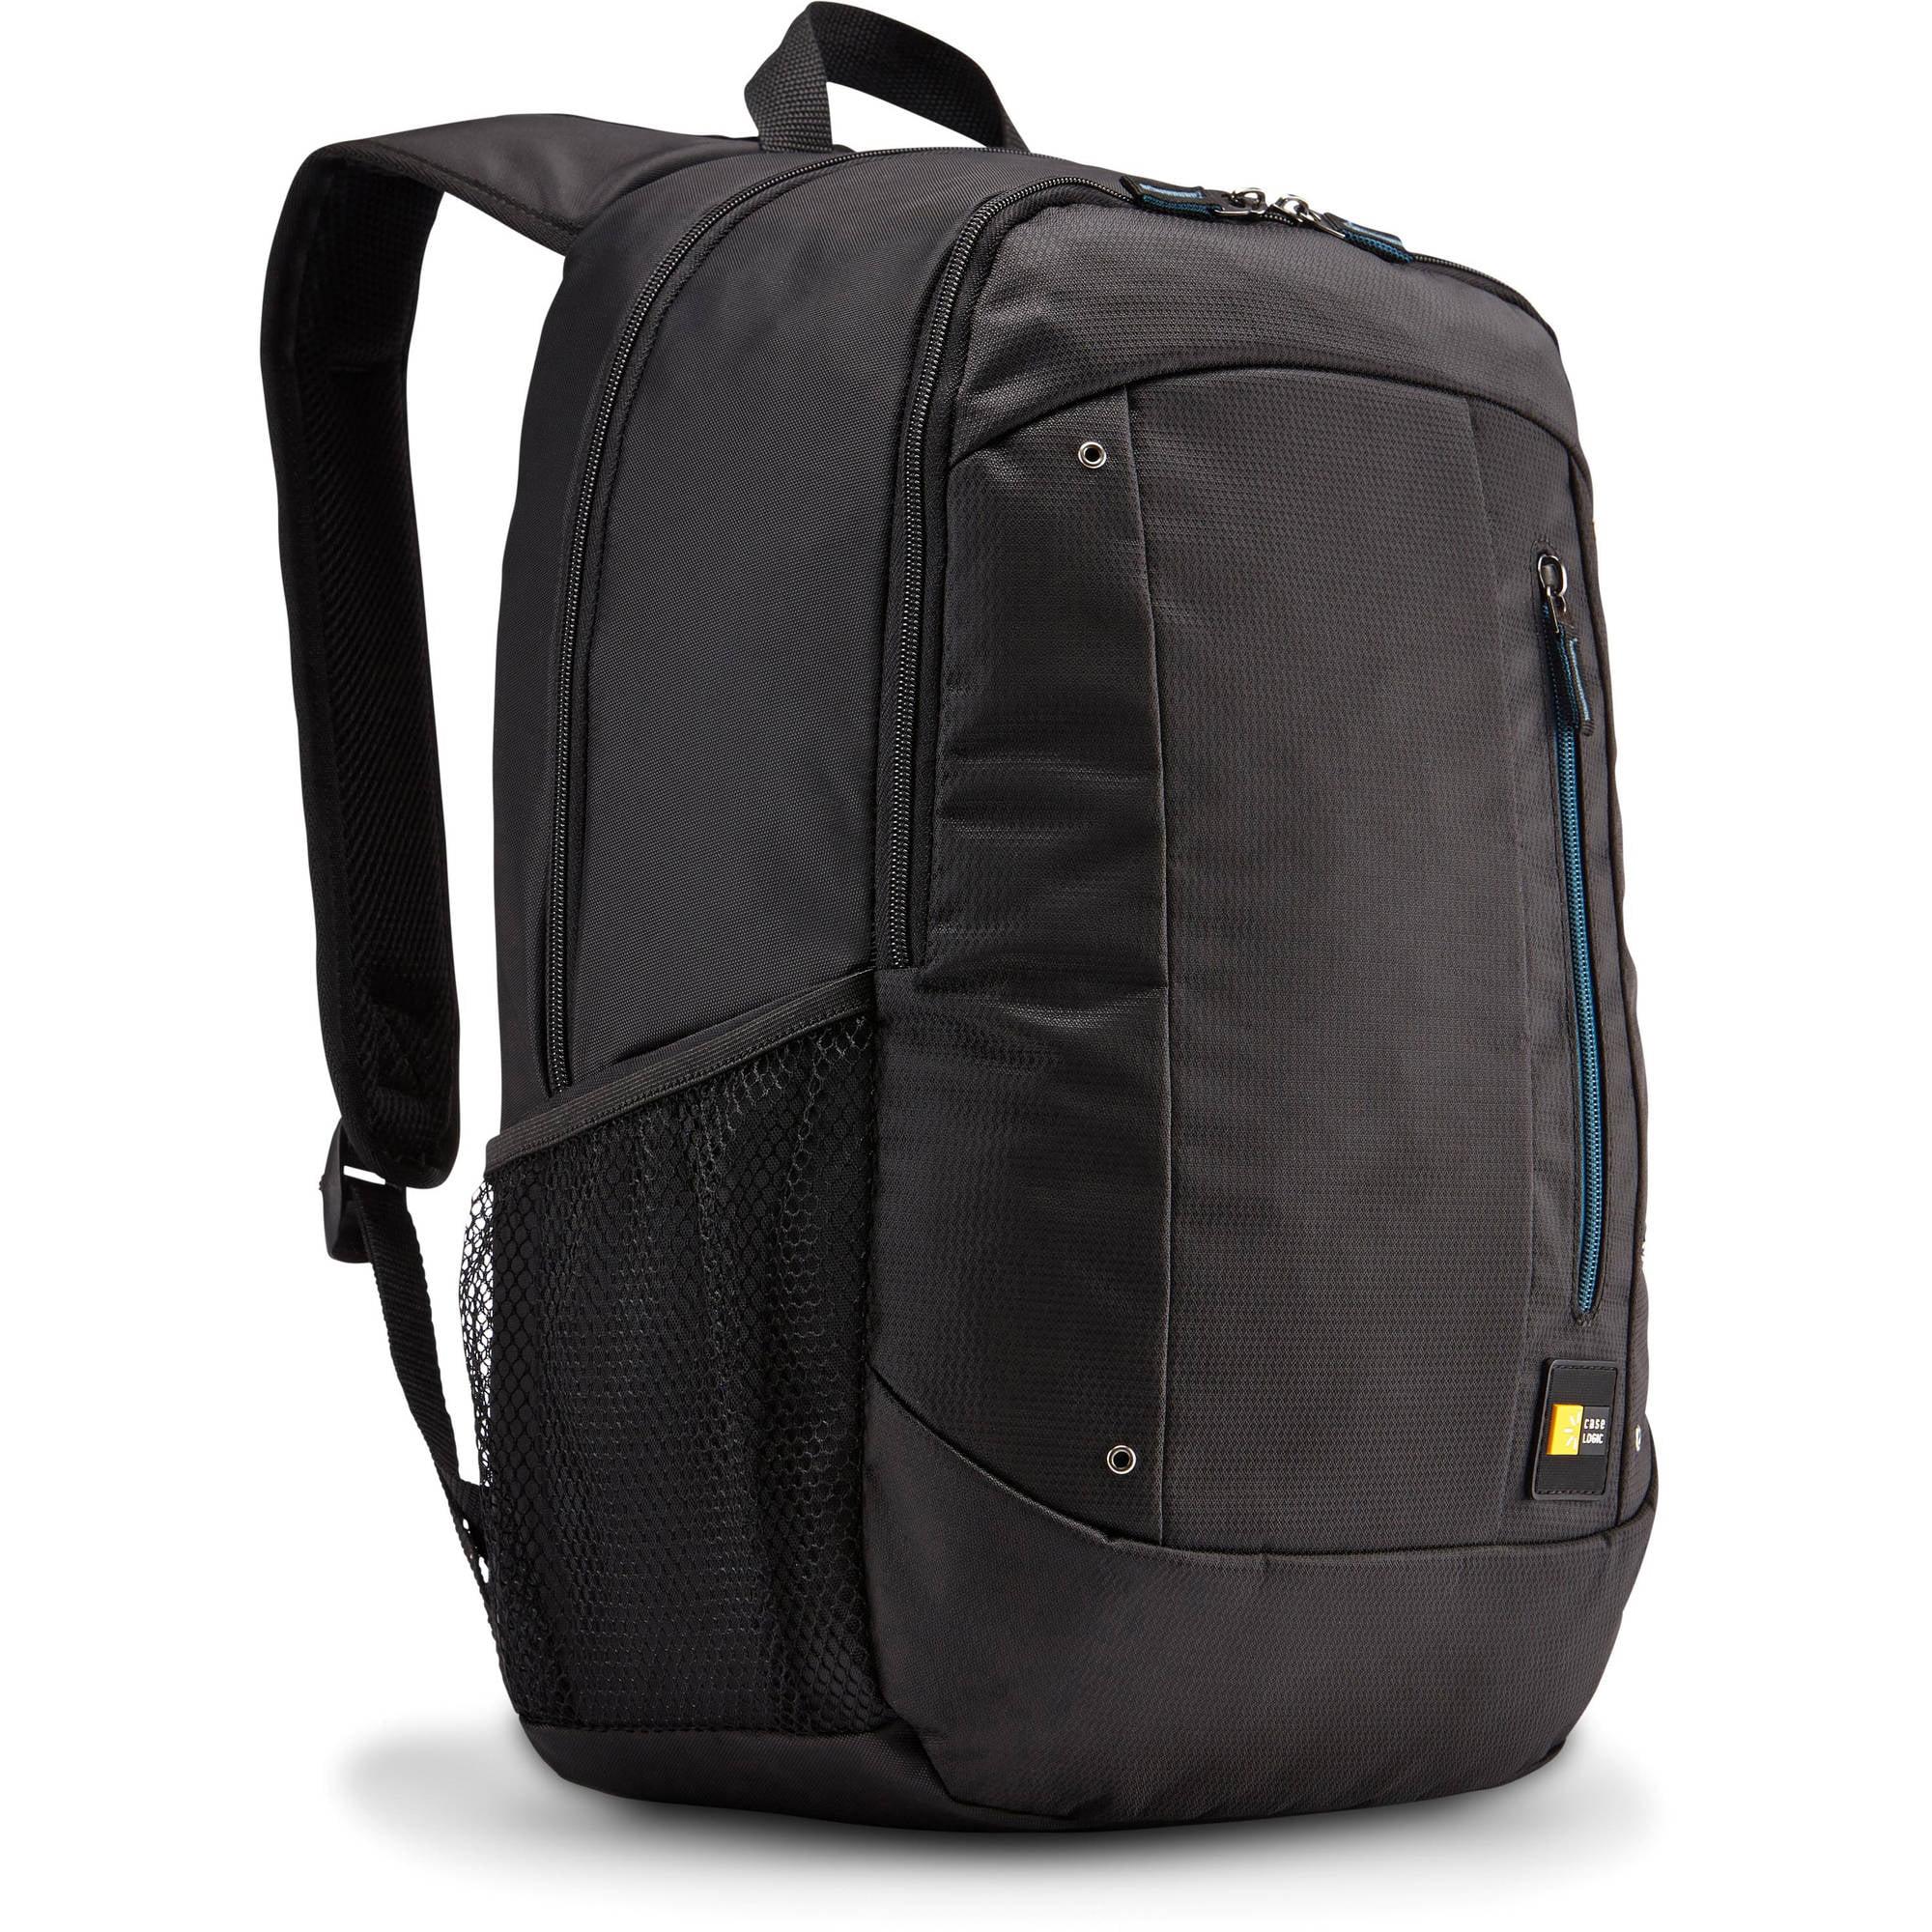 Case Logic Laptop and Tablet Backpack - Black (WMBP-115)